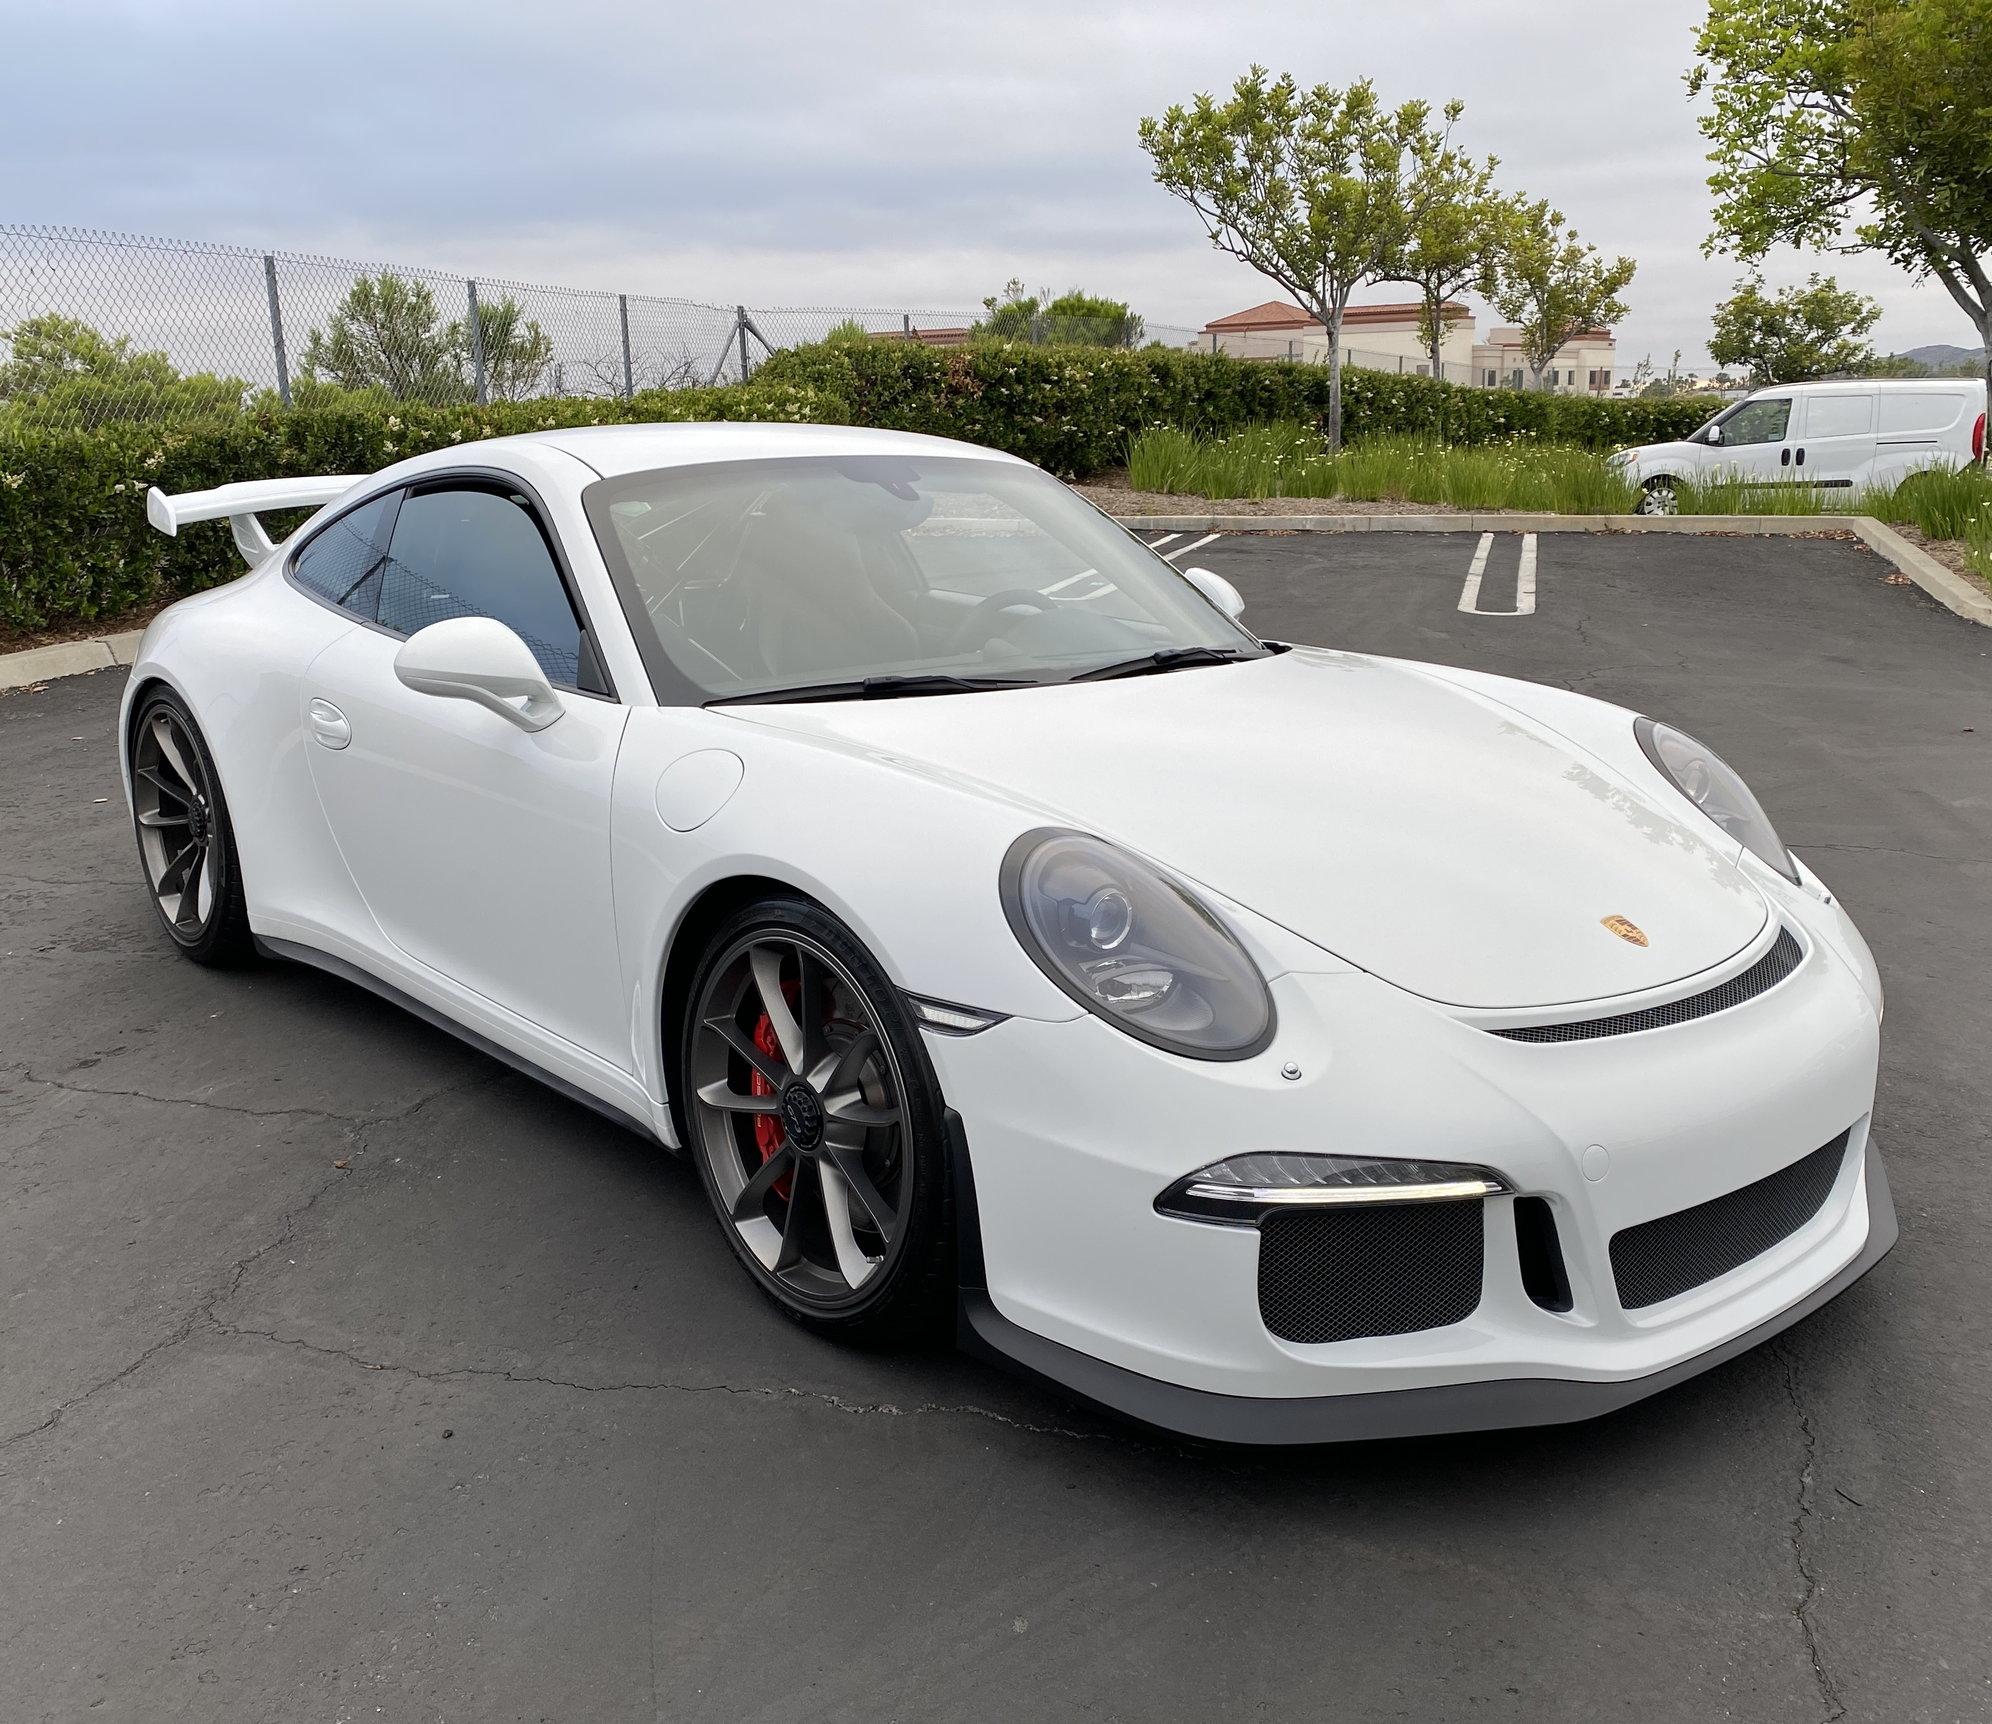 2014 Porsche GT3 - White - Extended Warranty - Private ...